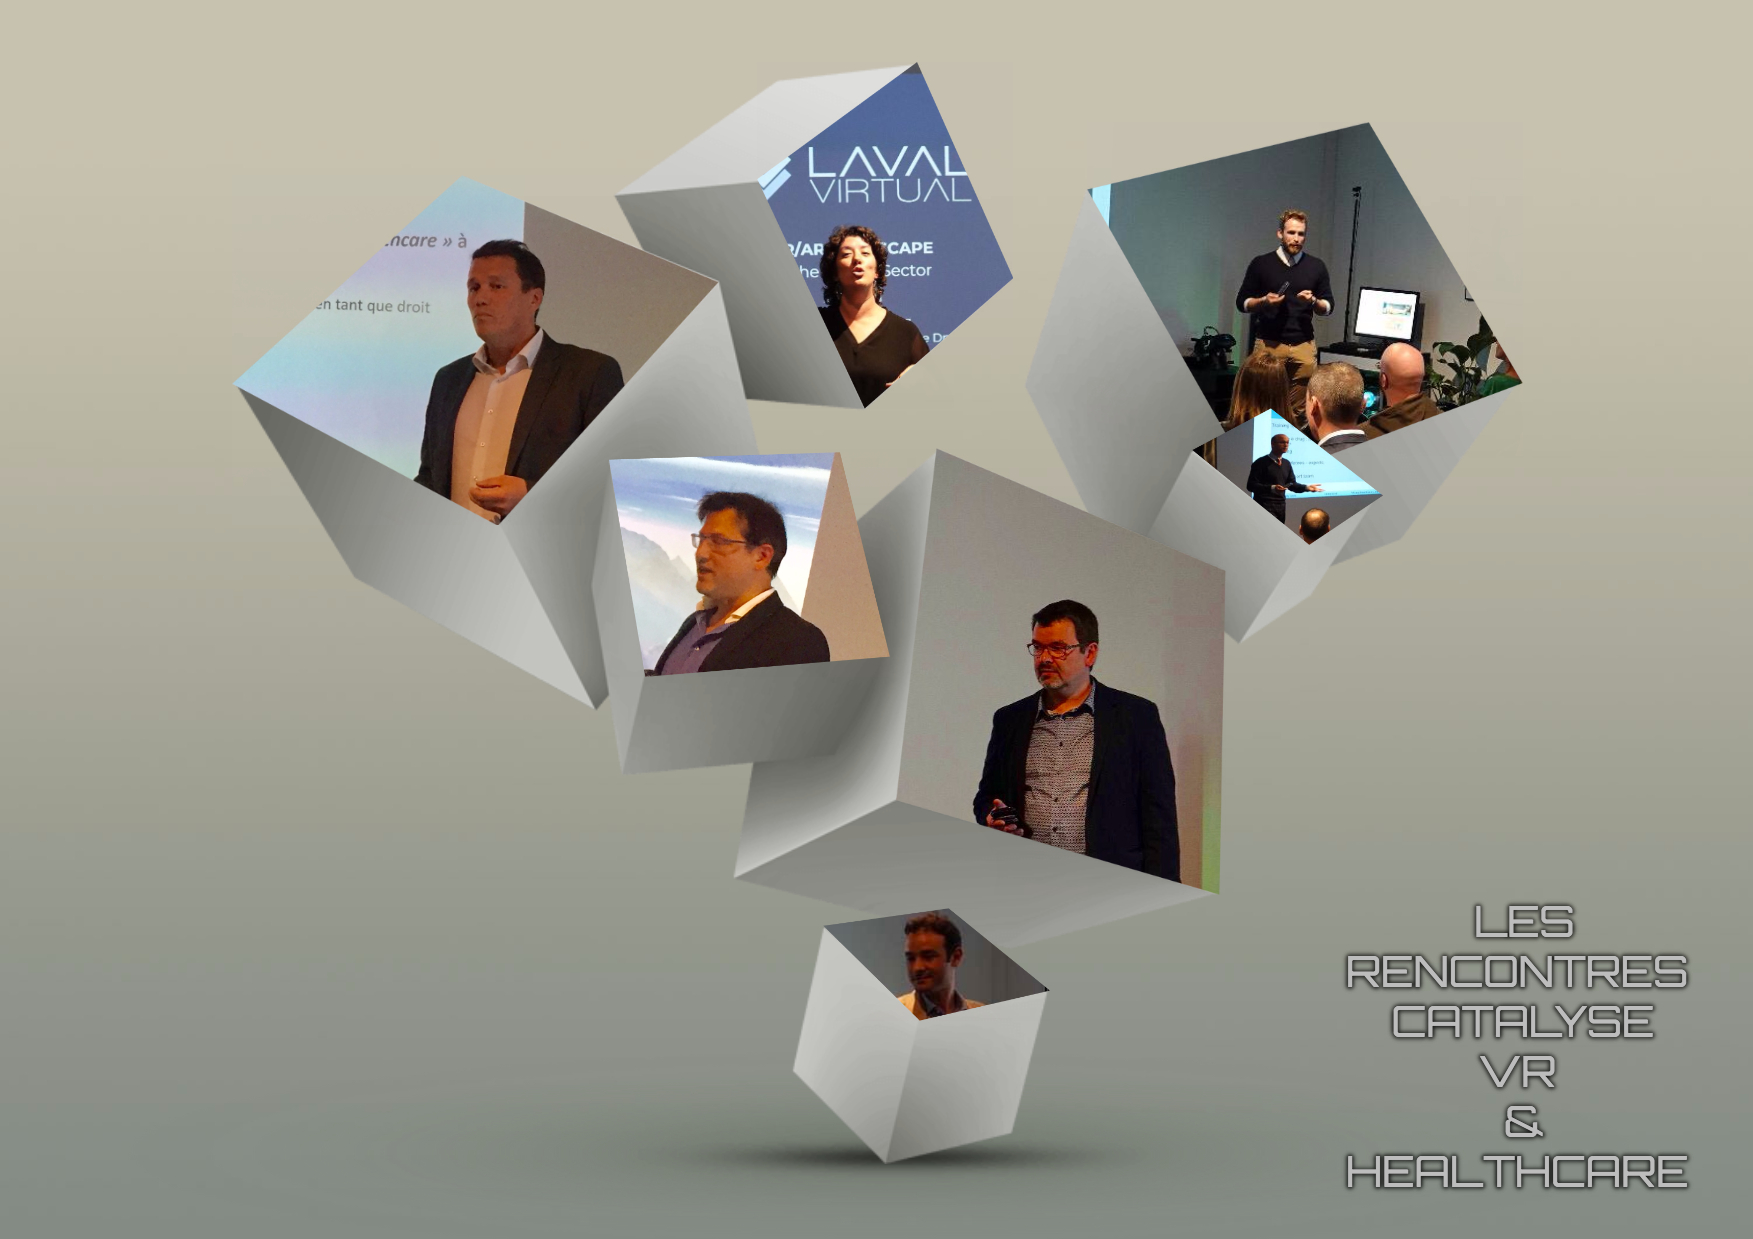 Les speakers des rencontres catalyse